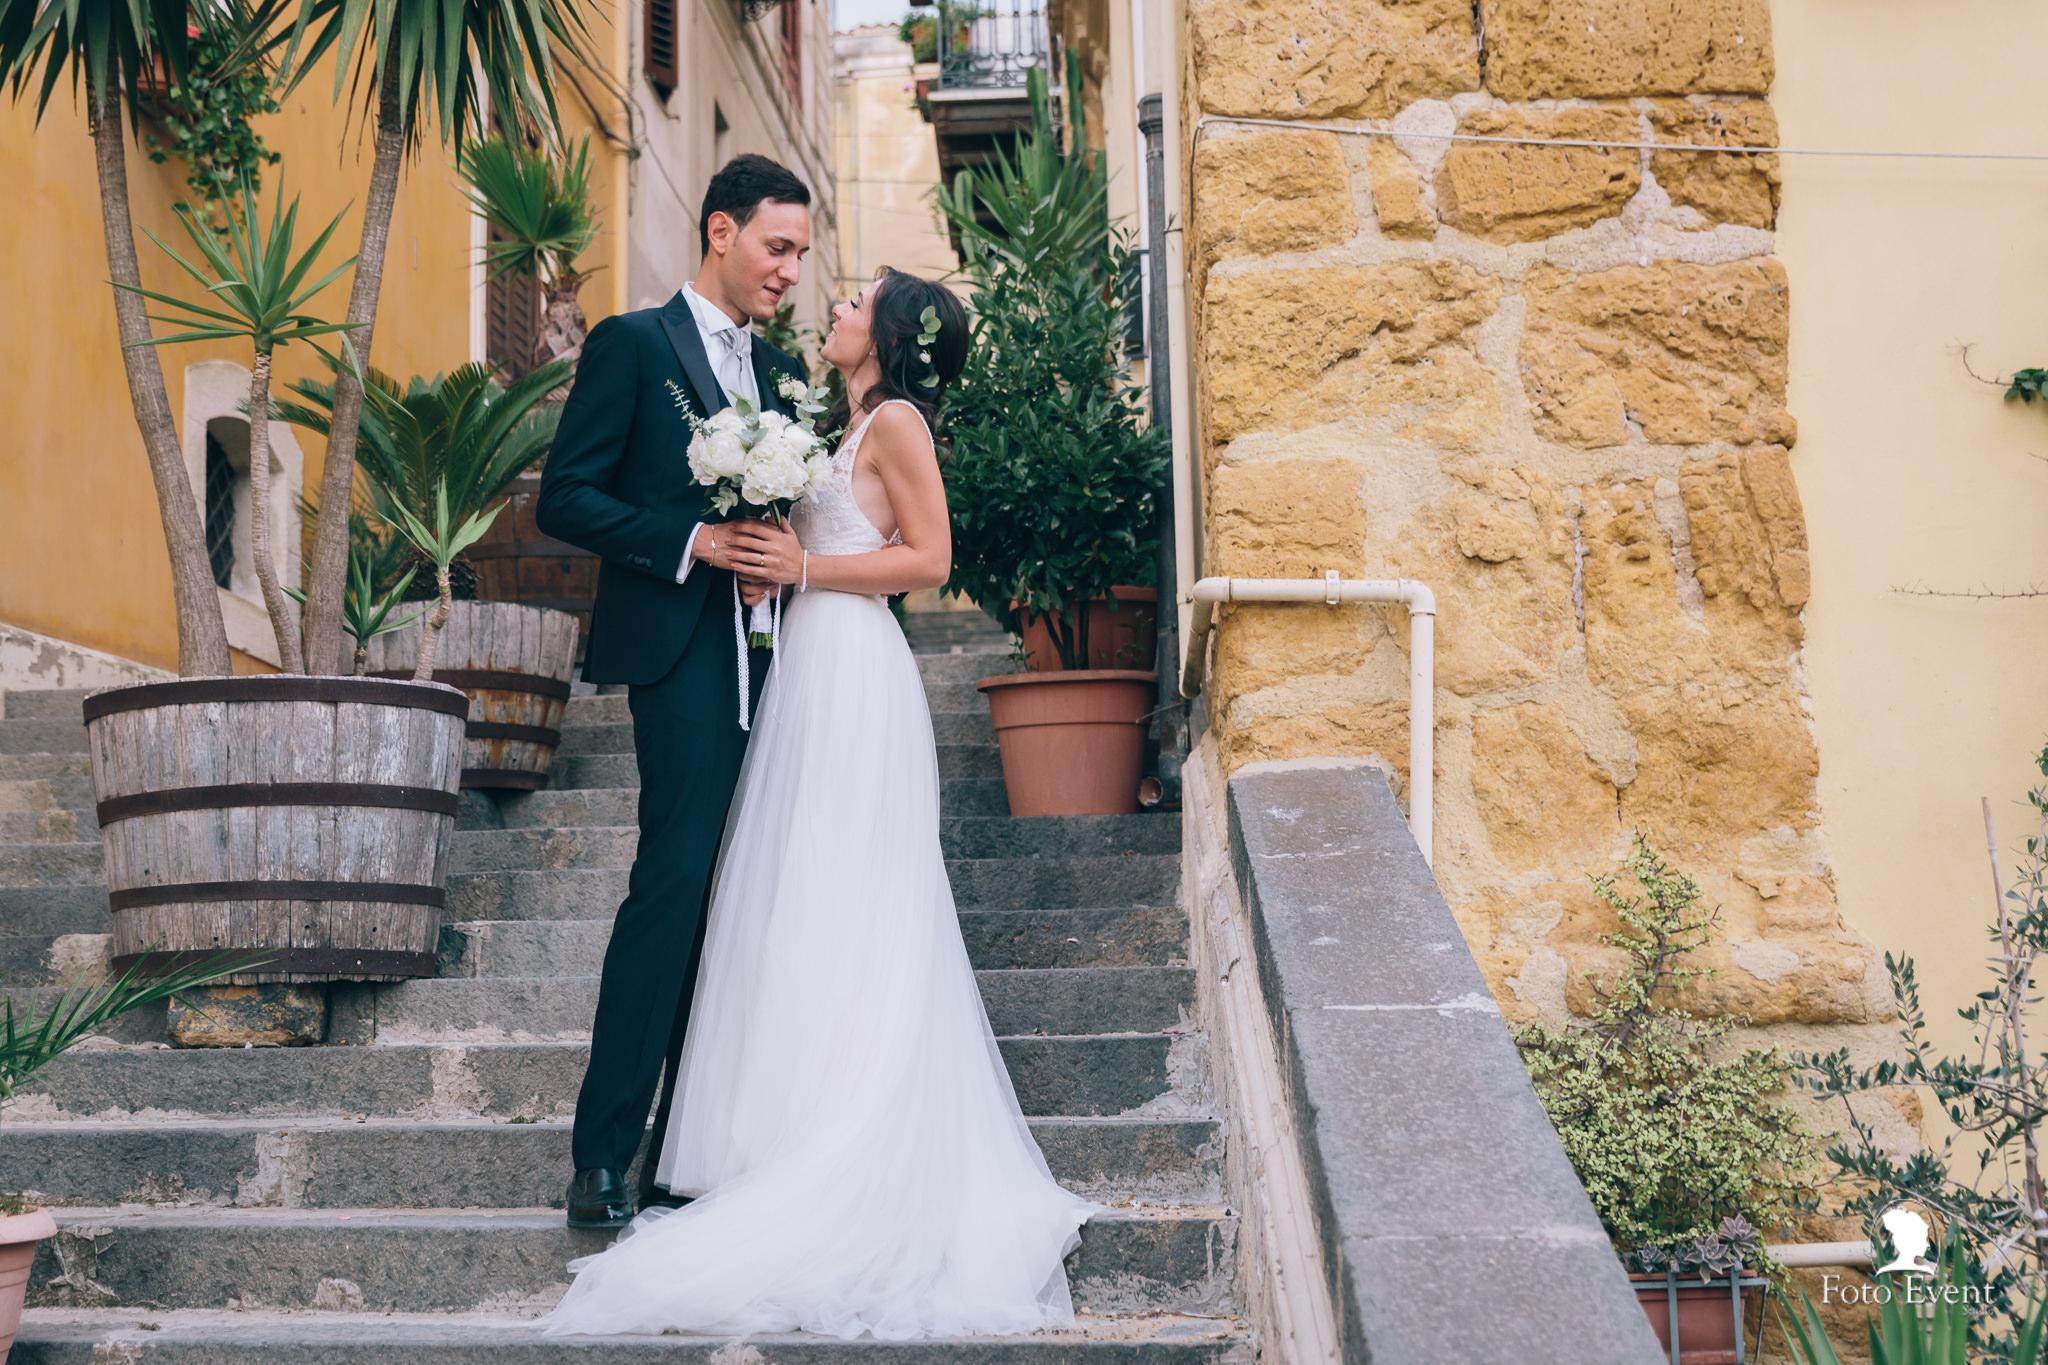 031-2019-08-23-Matrimonio-Lucia-e-Rosario-Scopelliti-5DE-1585